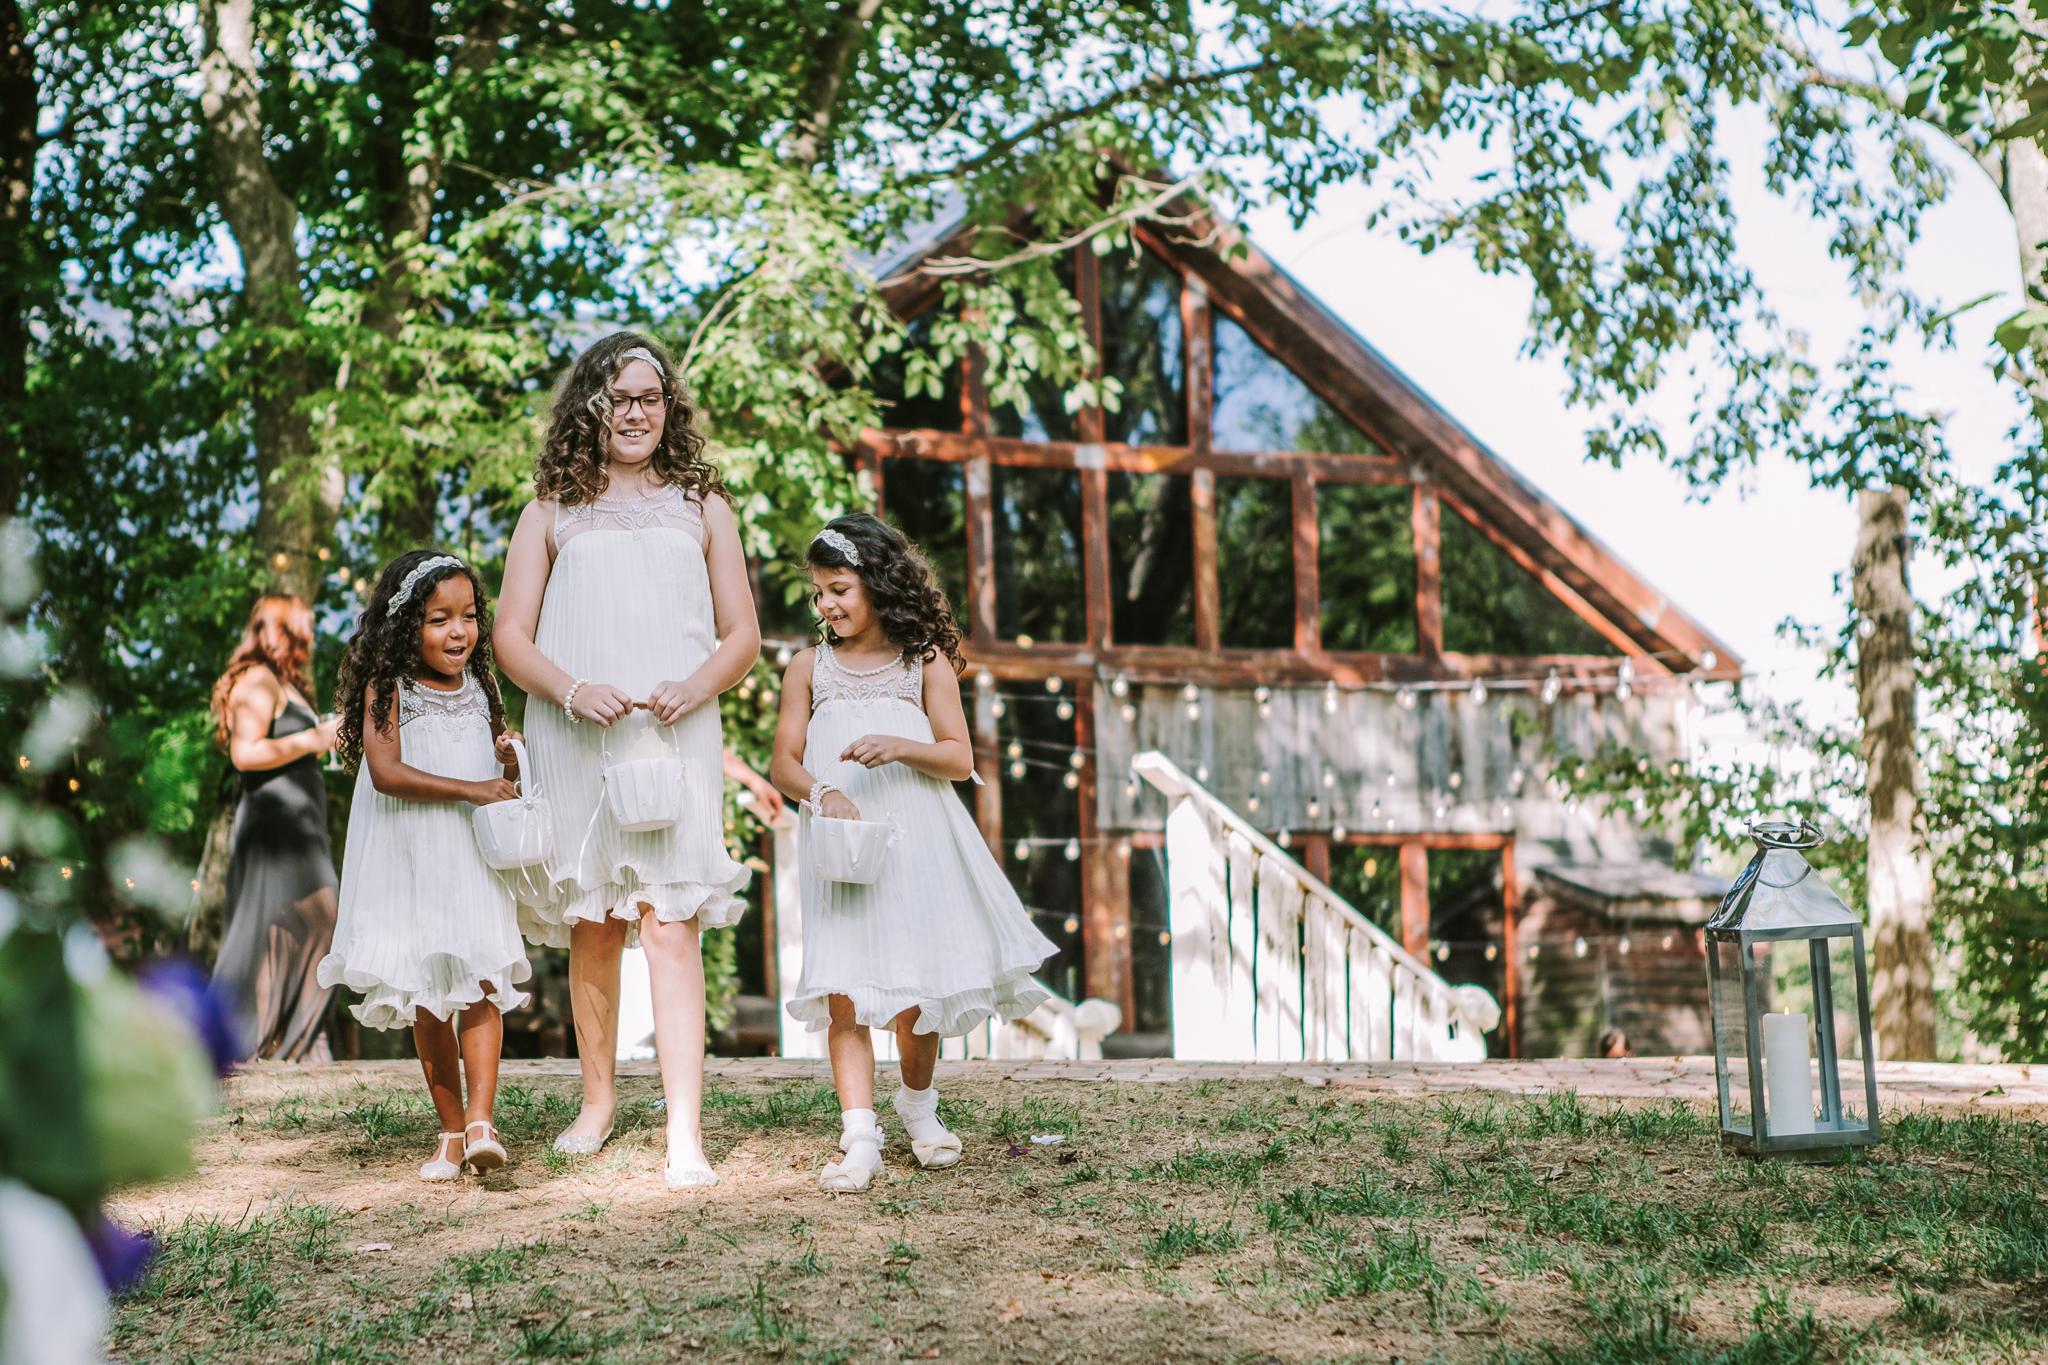 Richmond Kentucky Wedding Photographer - Ariana Jordan Photography -4.jpg